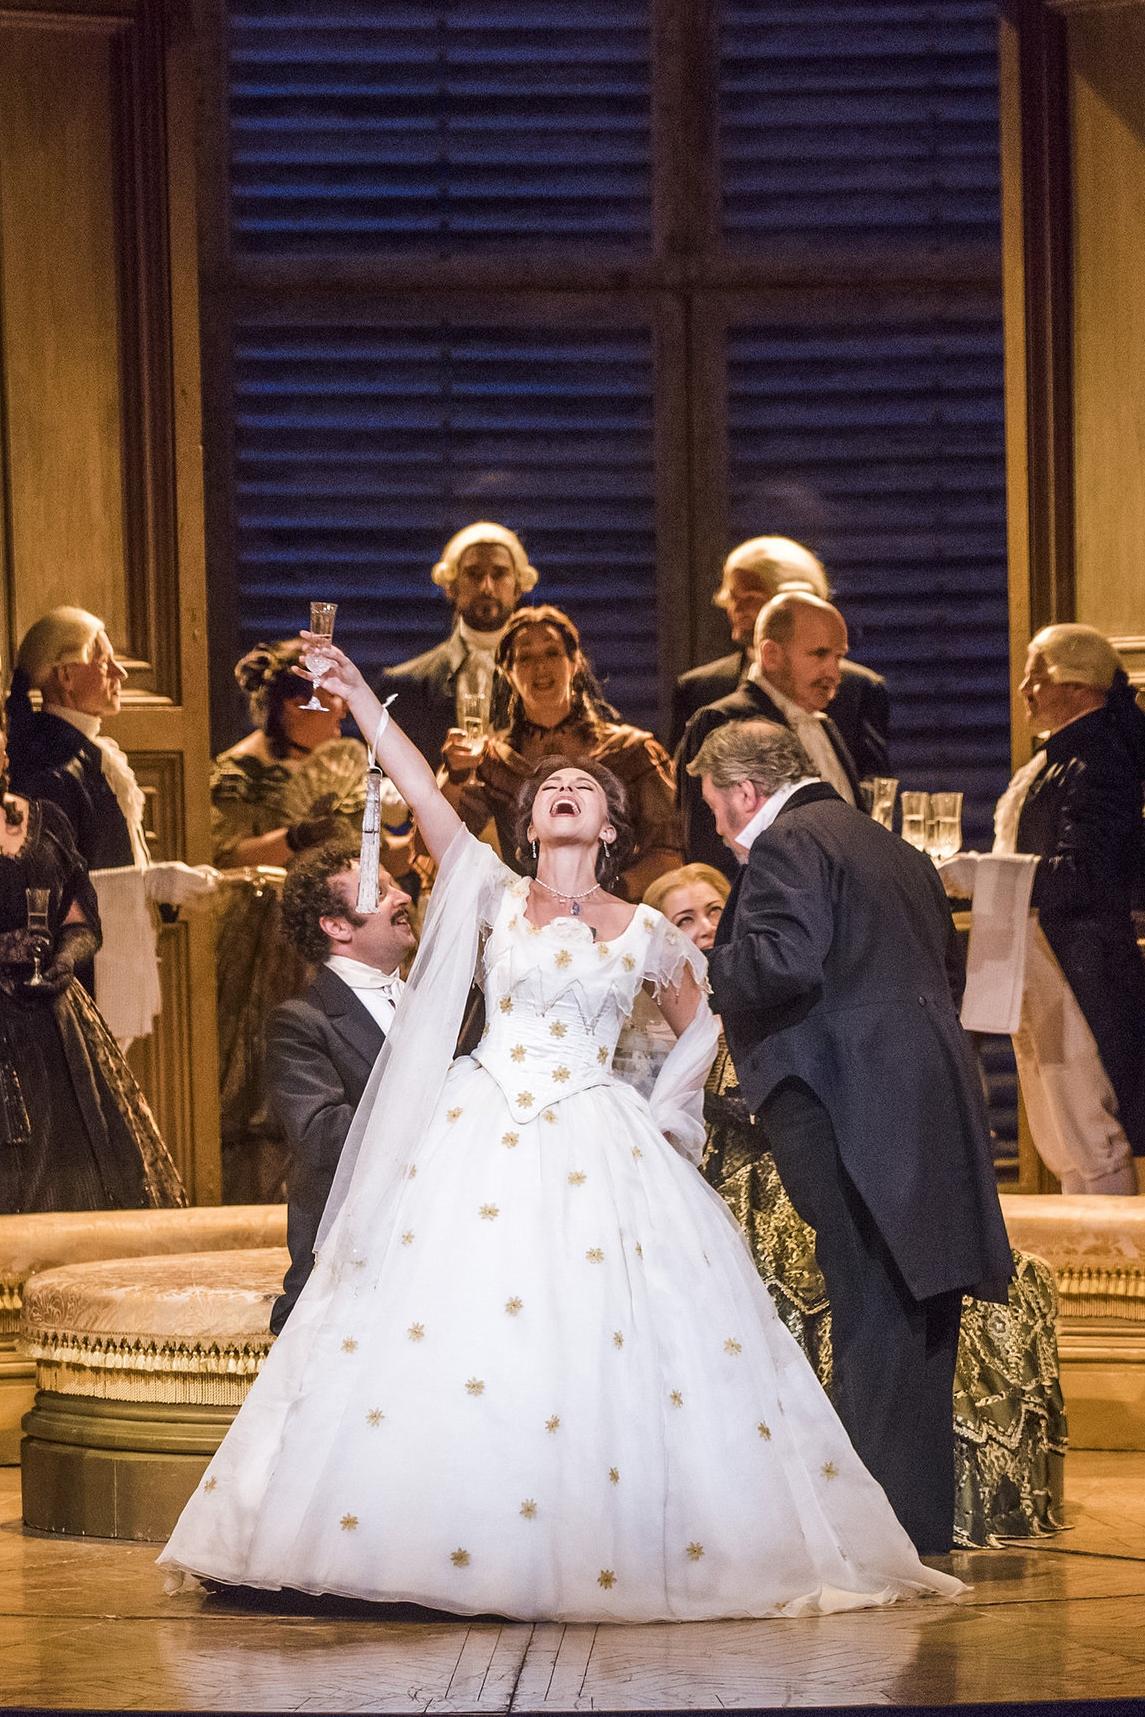 Violetta, La traviata    Theater Basel  October 21, 28; November 1, 3 2017   new production; house debut